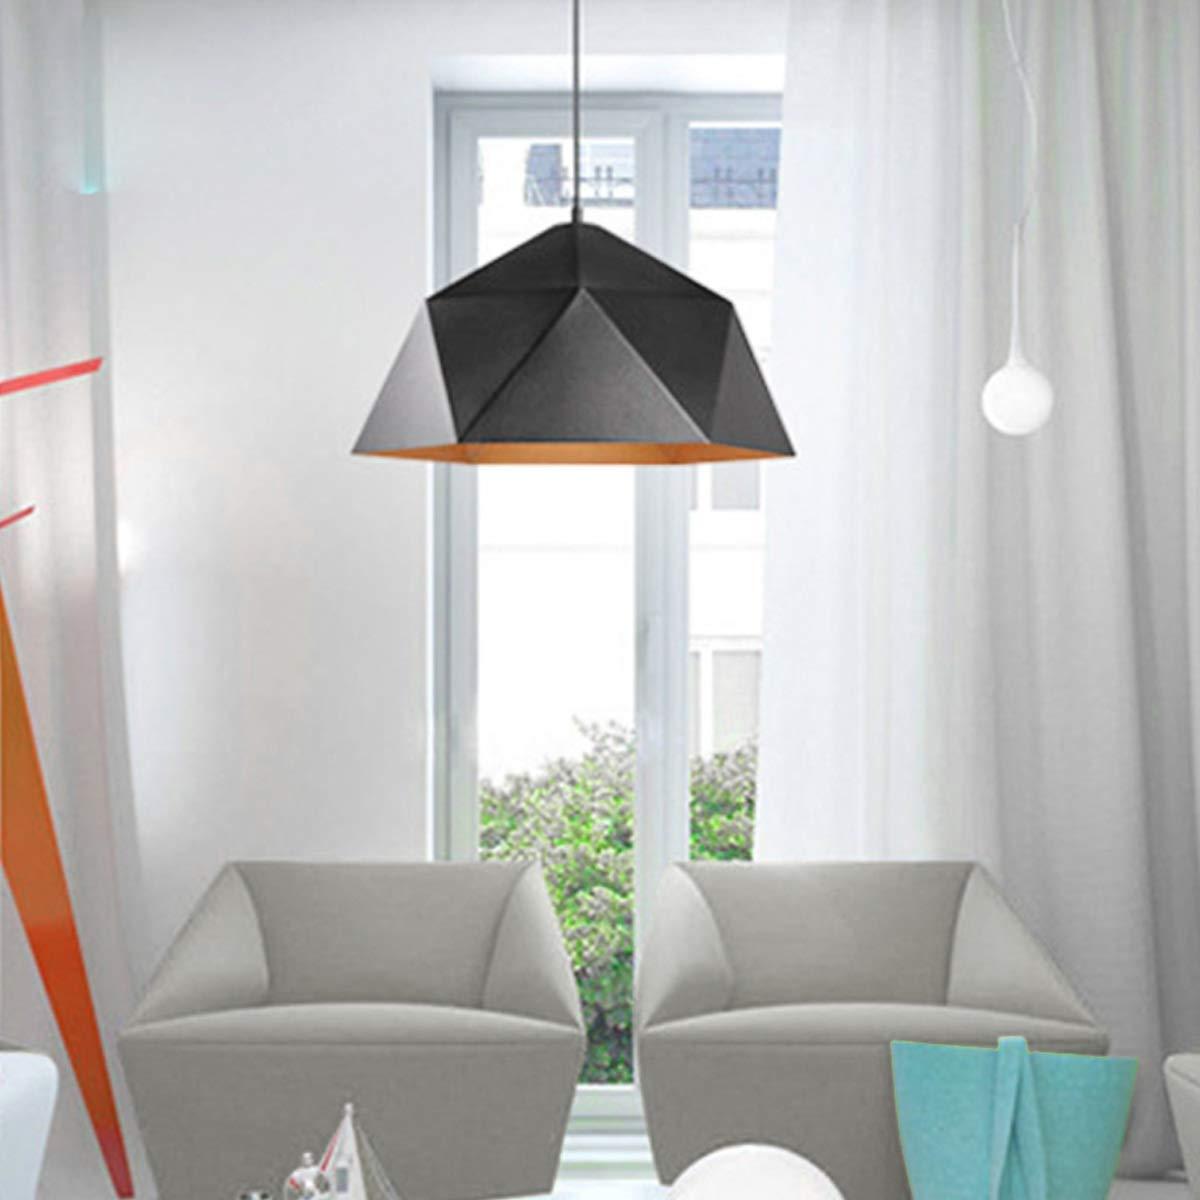 NANGE Wrought Iron Diamond Pendant Lamp, Industrial Wind Ancient Ways Geometry Pot Droplight,Cafe Restaurant Chandelier,E27(Without Light Source) (Color : Black, Size : AC 110V) by NANGE (Image #3)